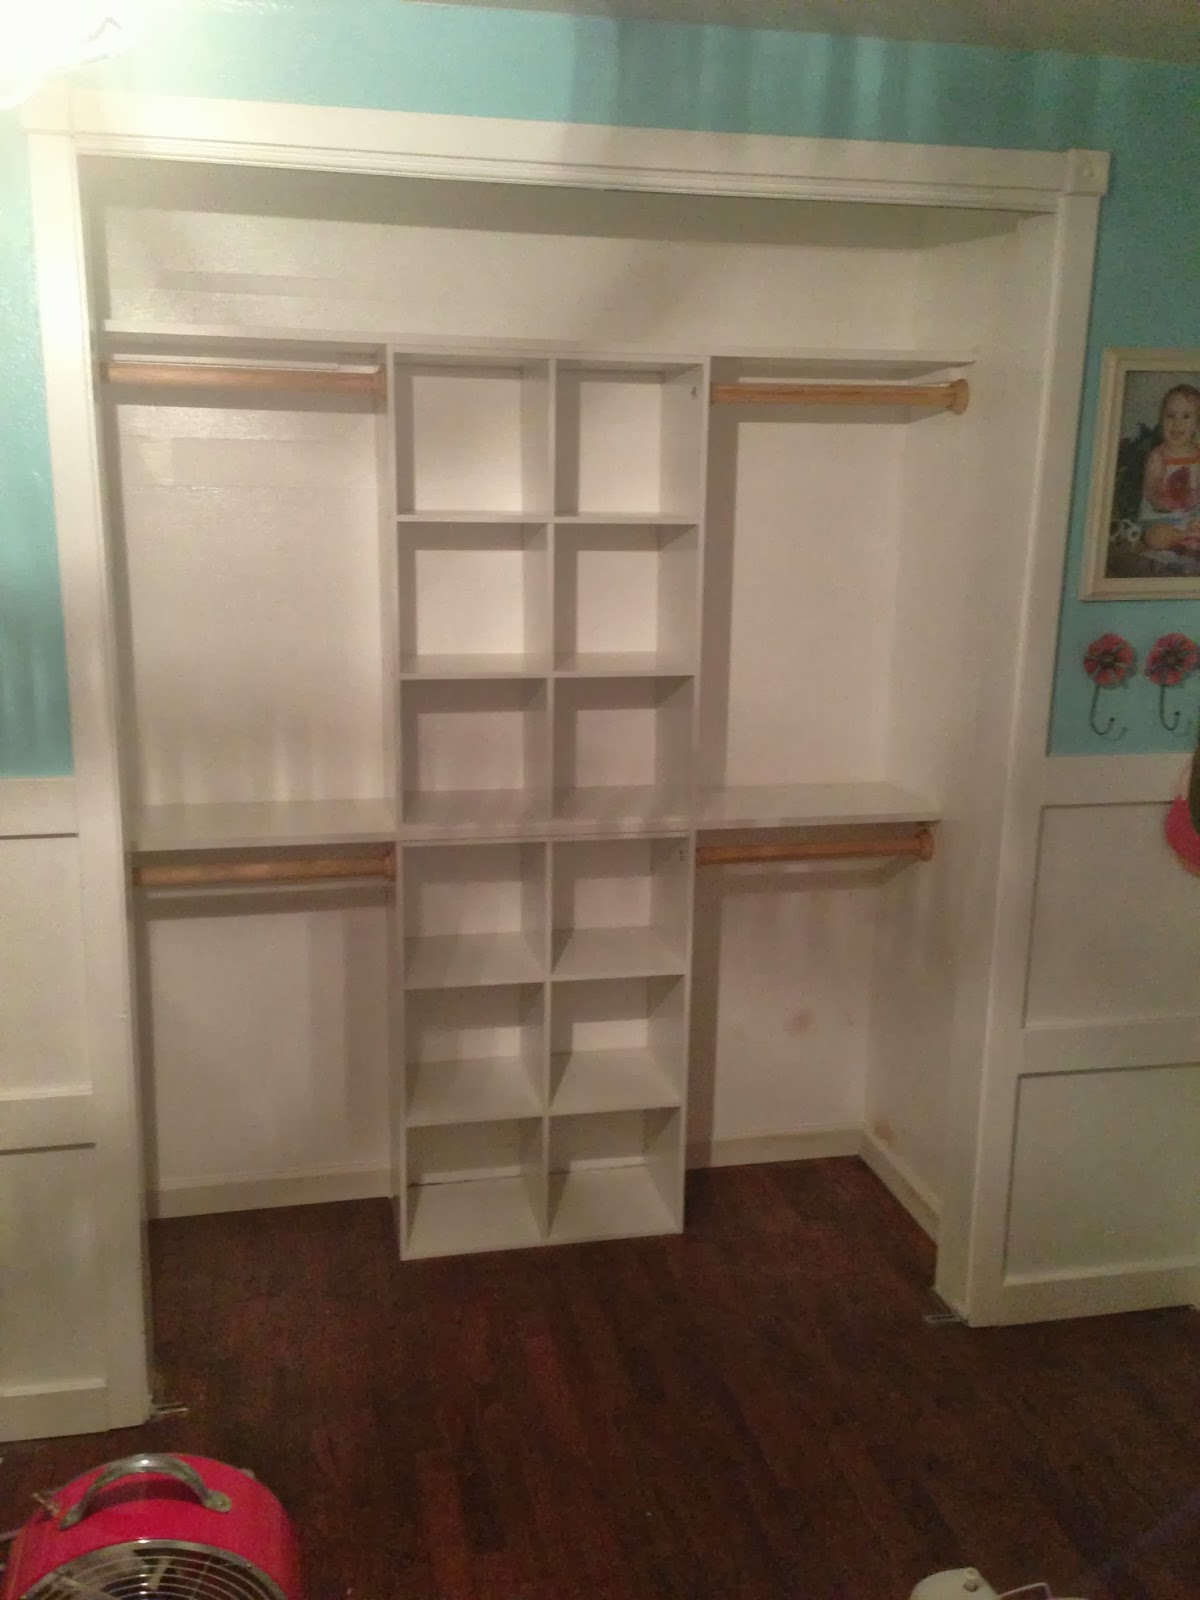 One Thrifty Chick Quick Fix Closet Organization